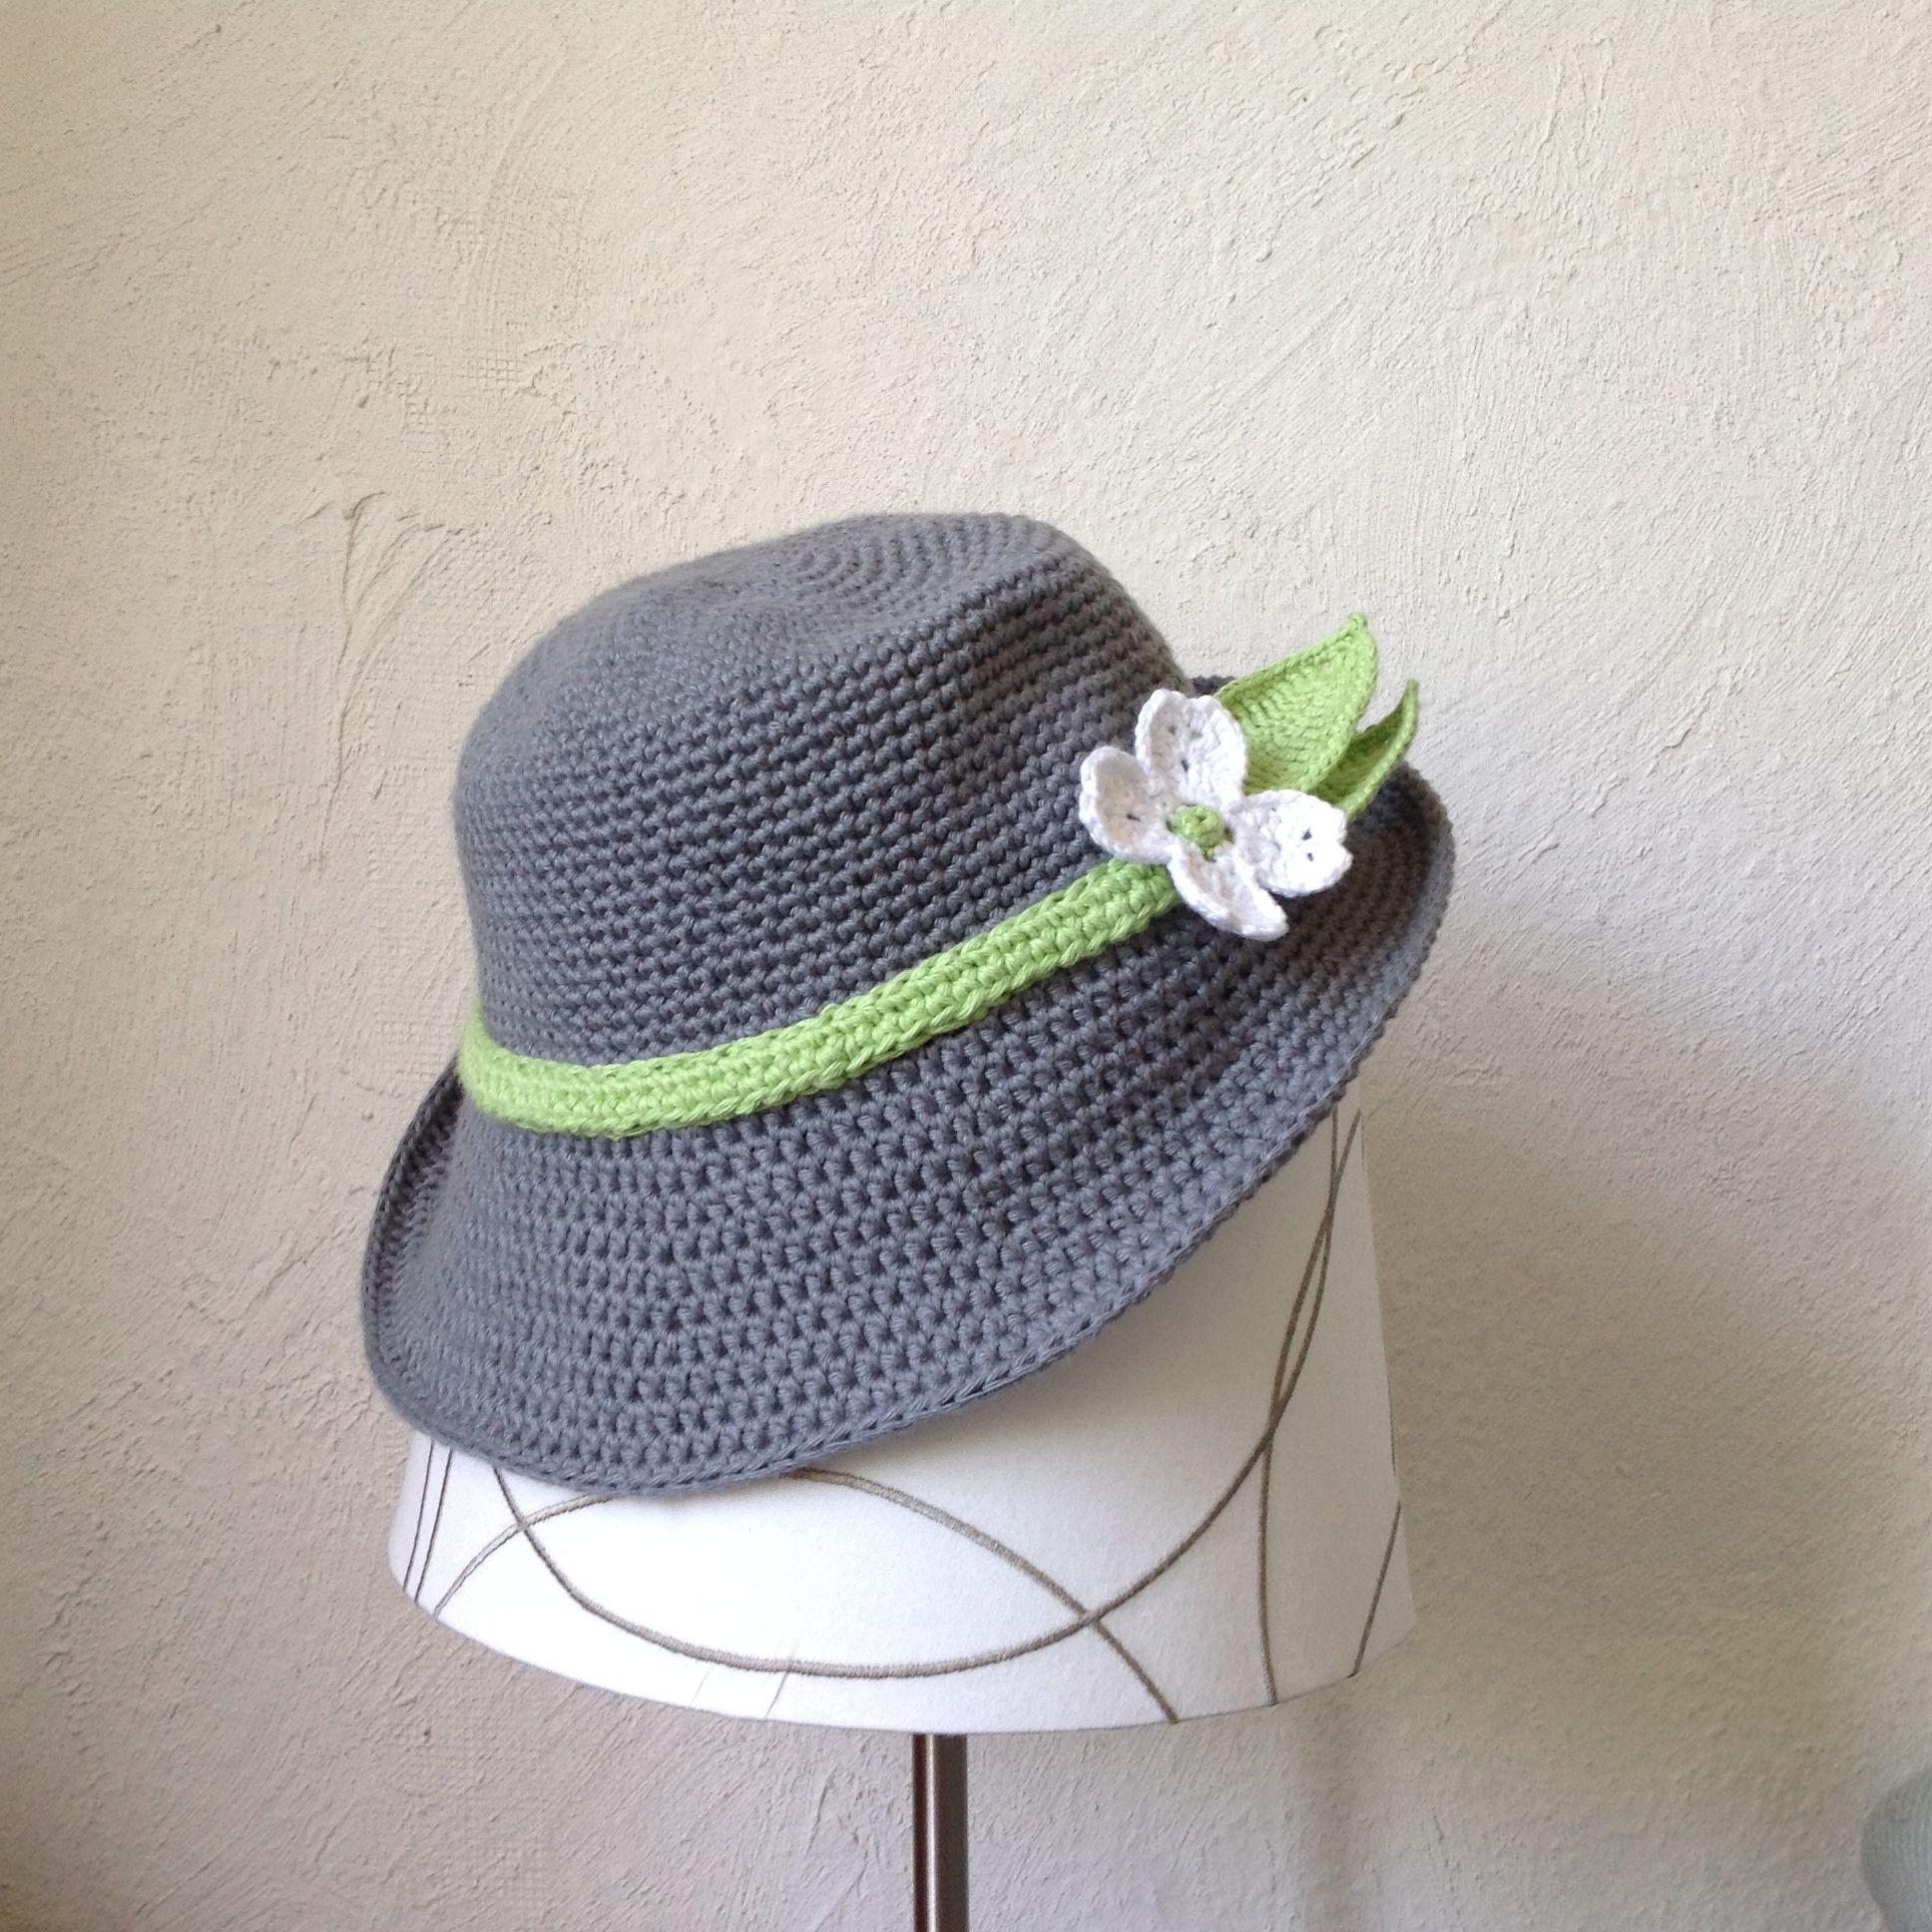 Gorro con patrón inglés | Gorro crochet | Pinterest | Patrones